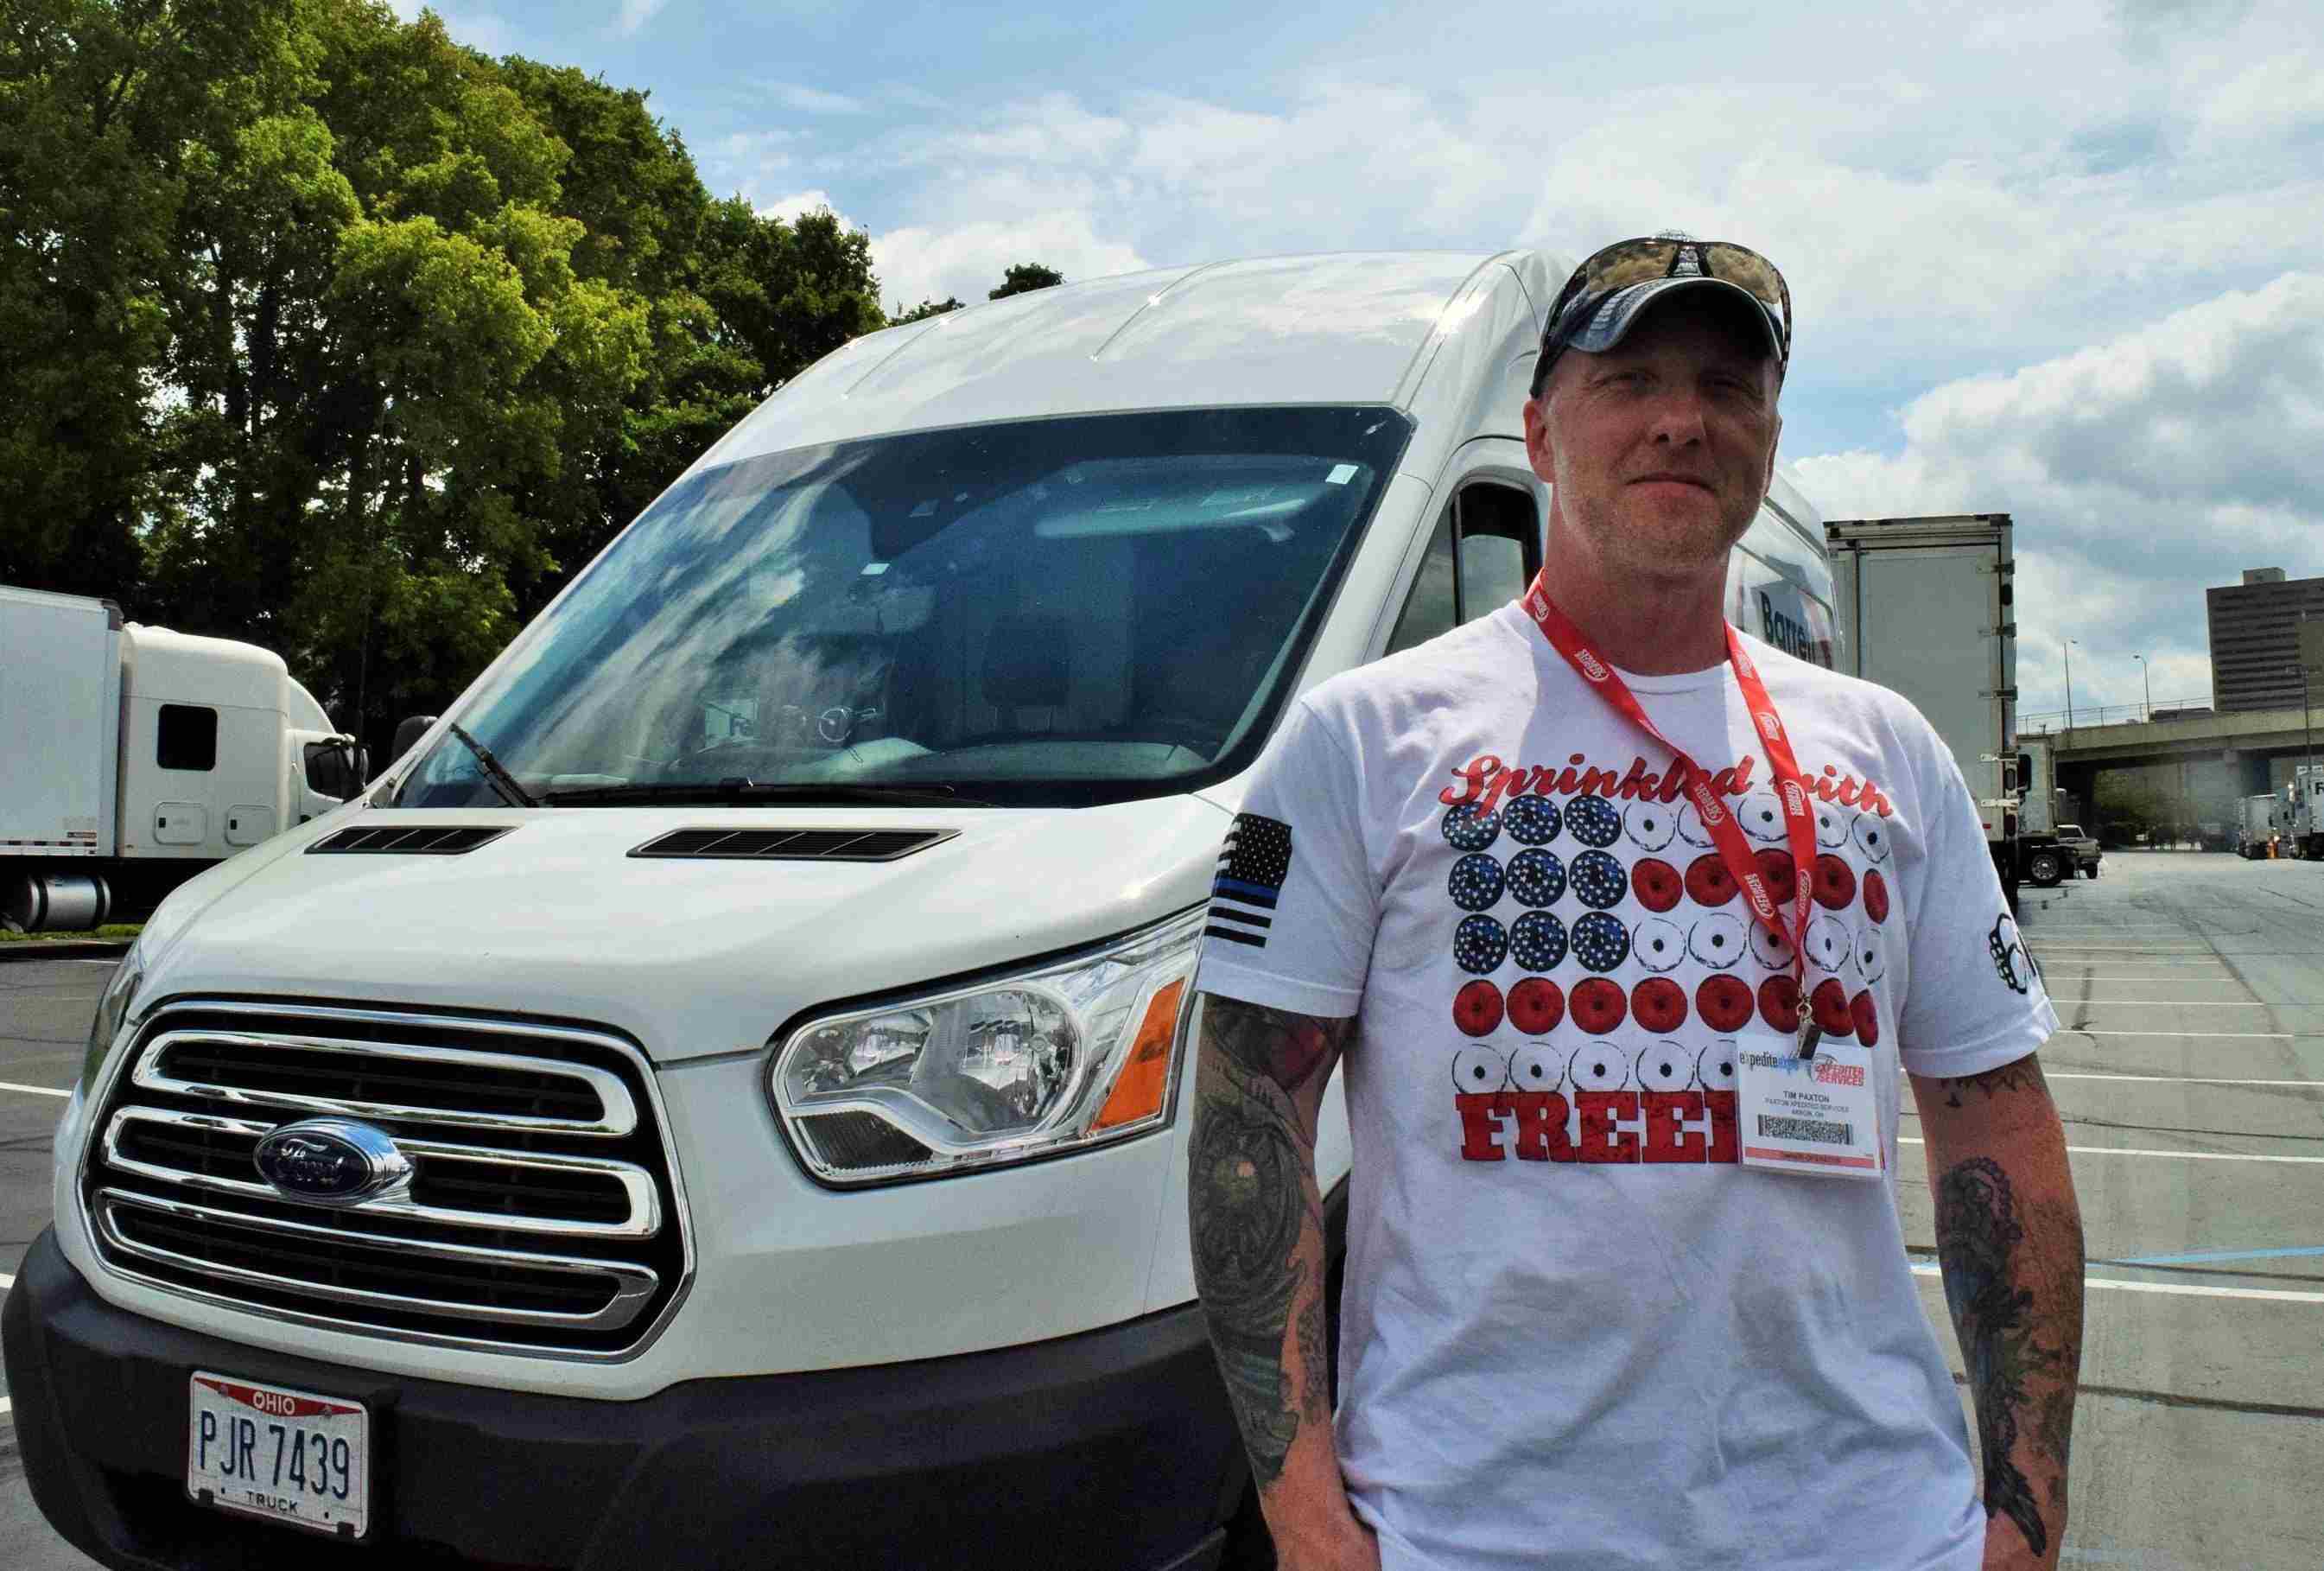 The lowdown on downsizing: Hauling in the cargo van owner-op